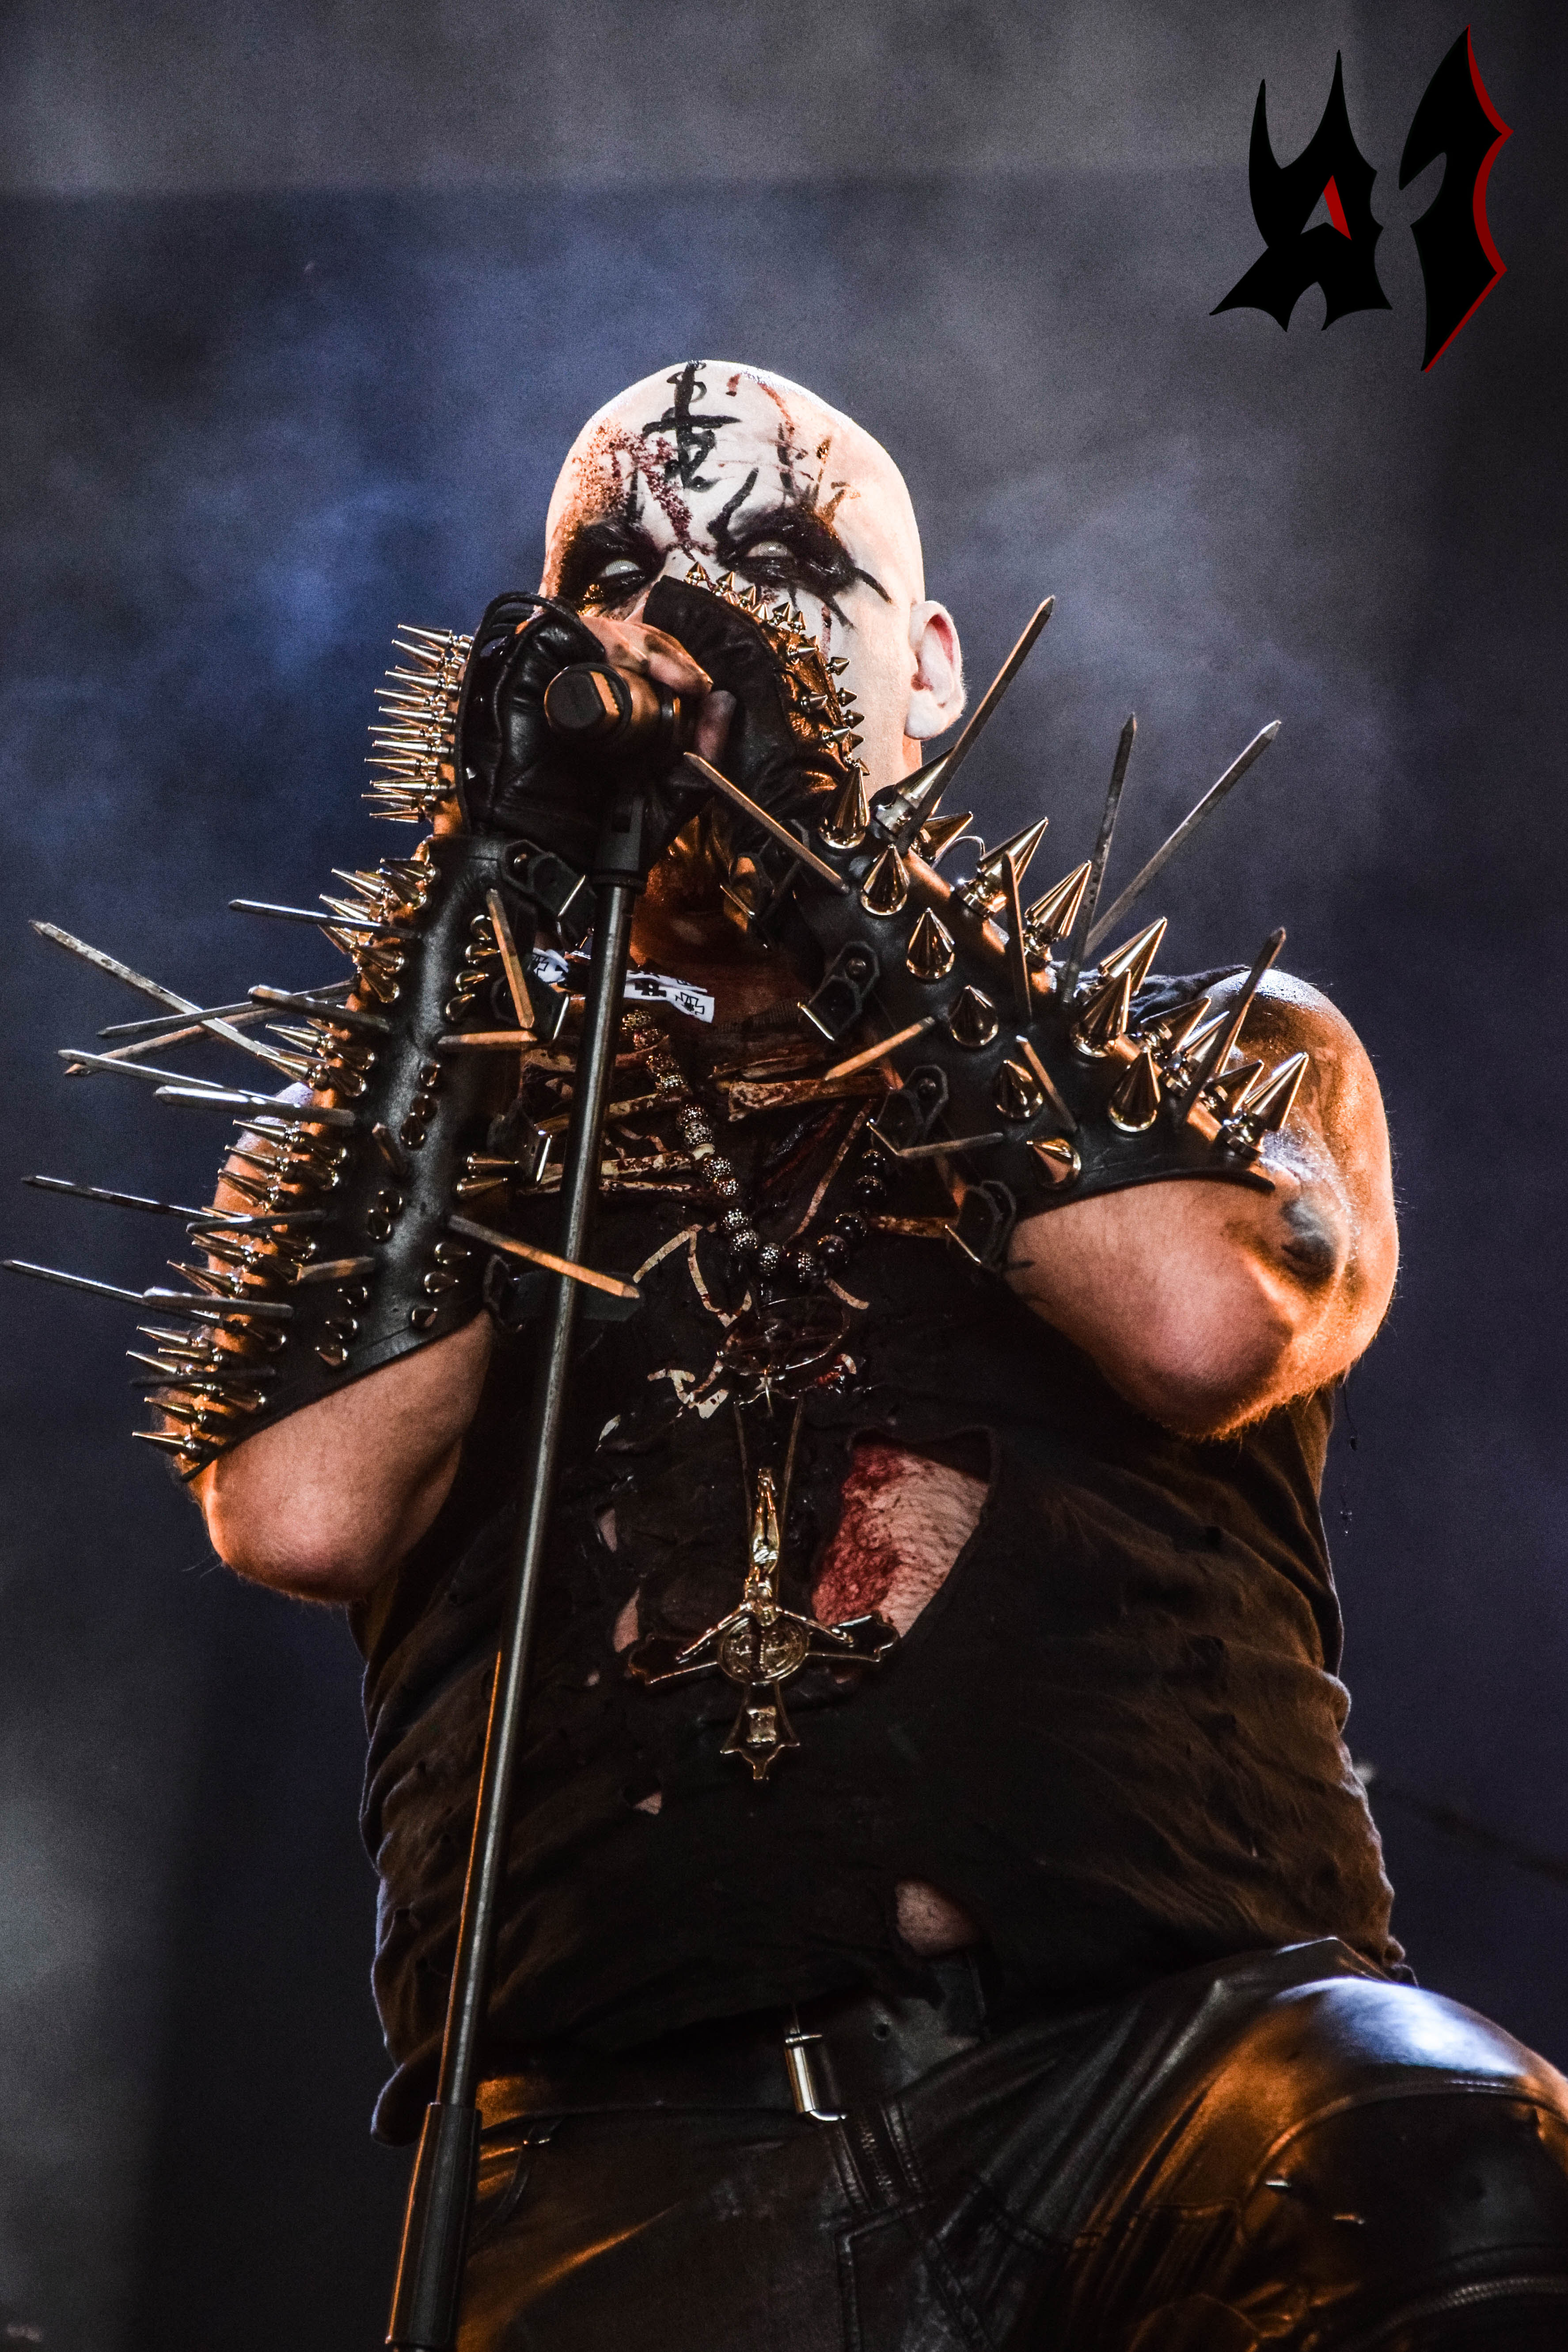 Hellfest - Day 1 - Nordjevel 11